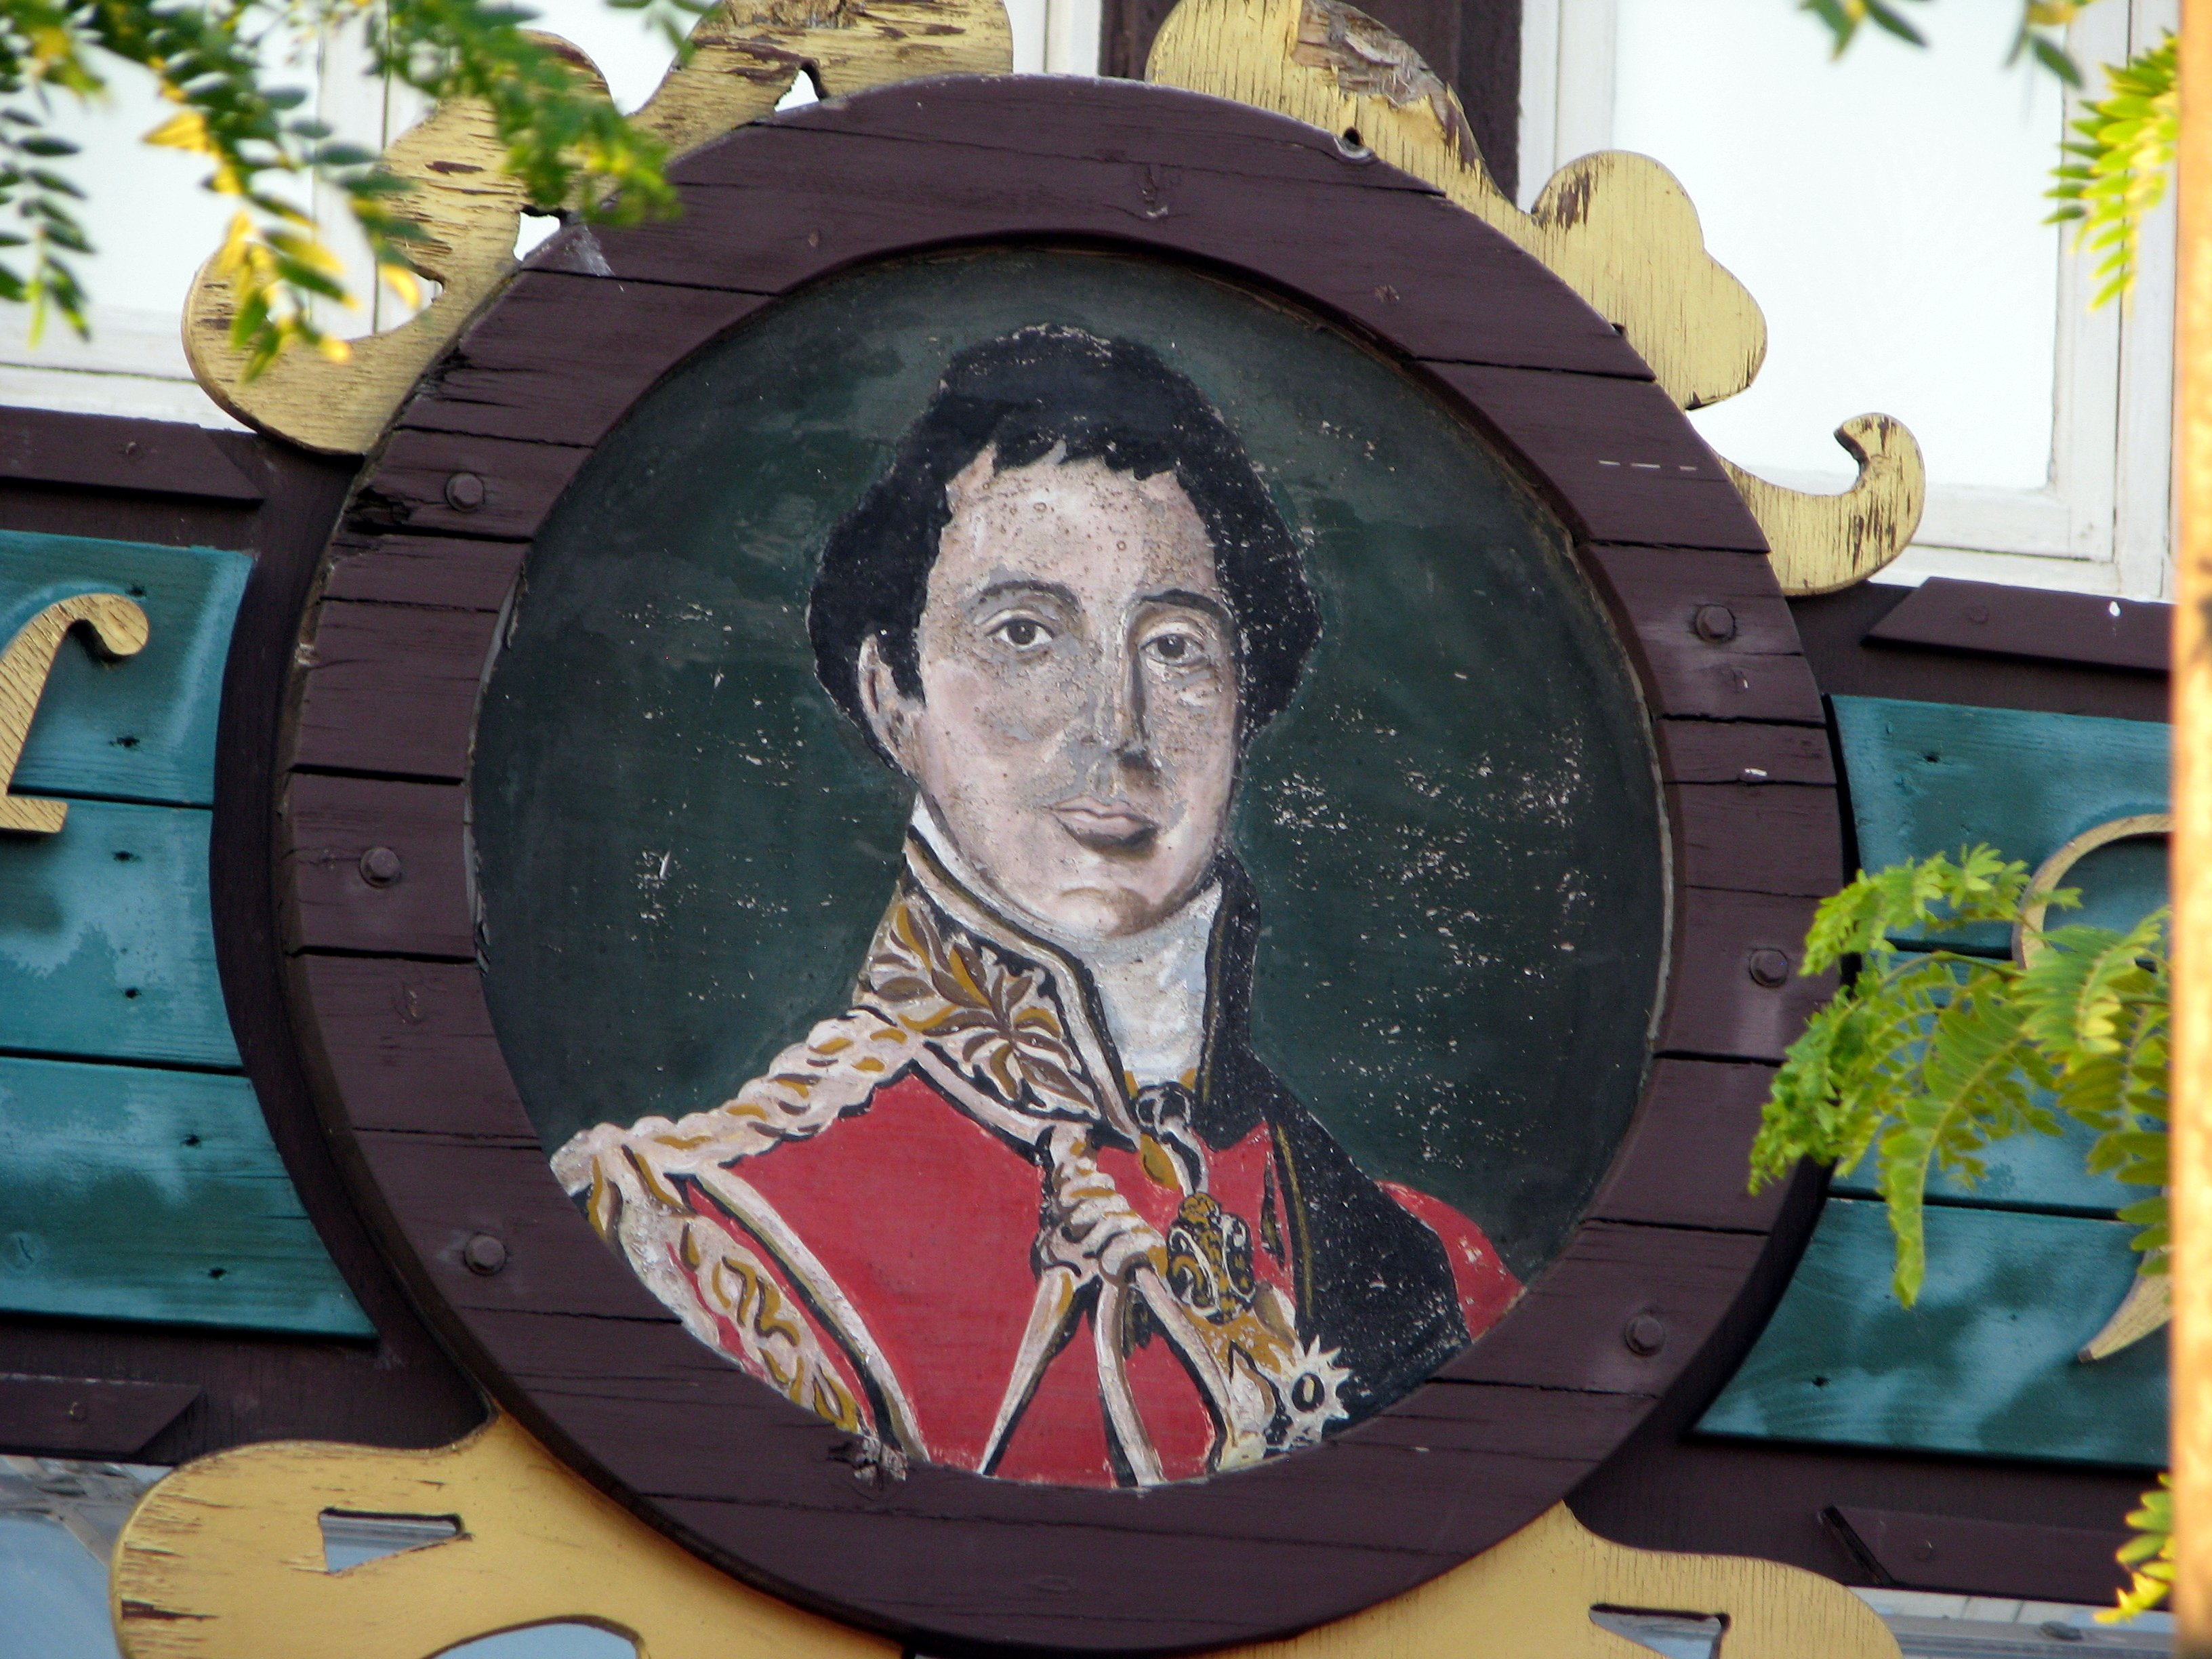 The Duke of Wellington Himself